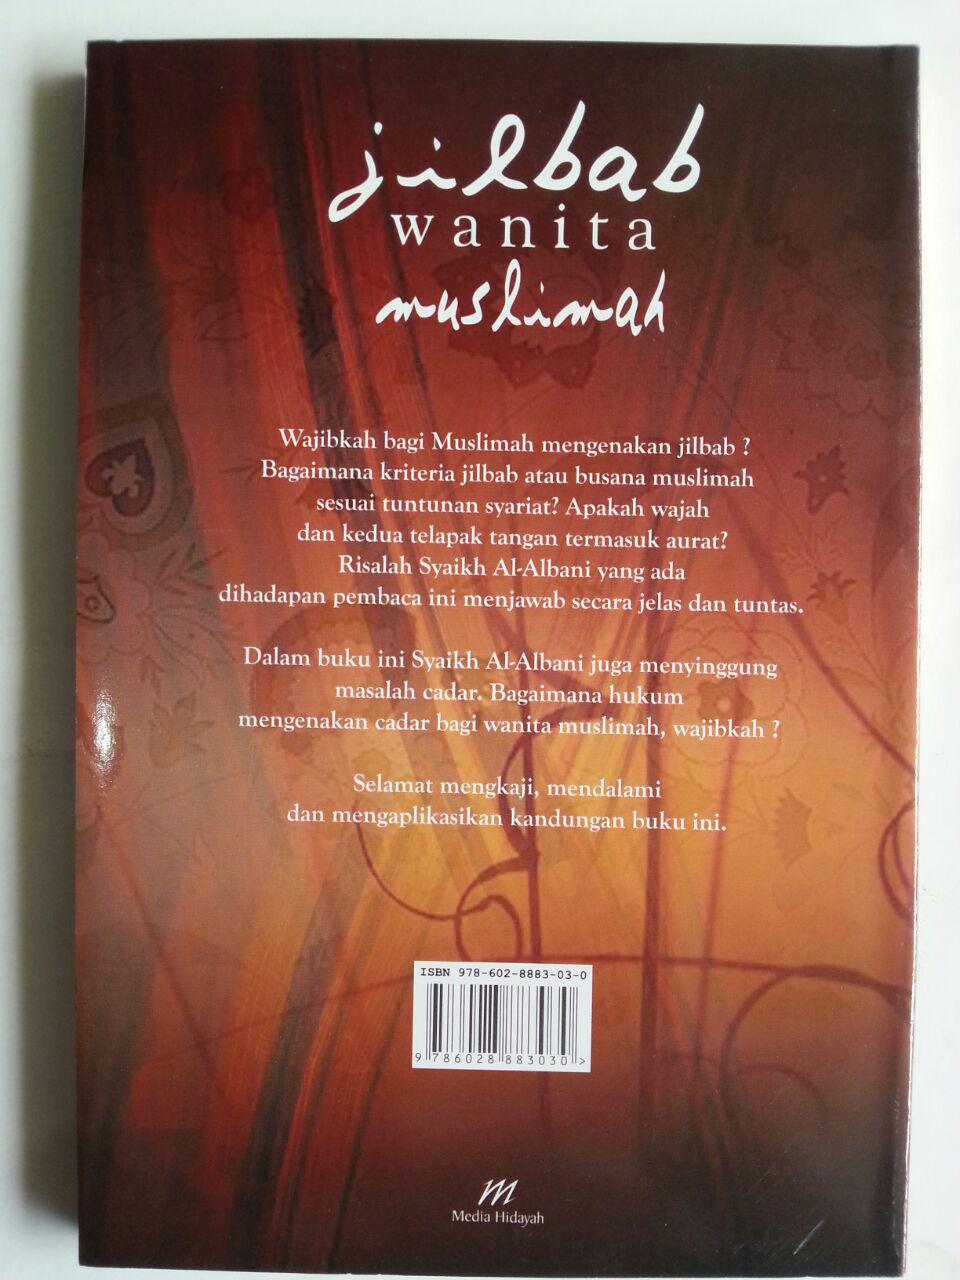 Buku Jilbab Wanita Muslimah cover